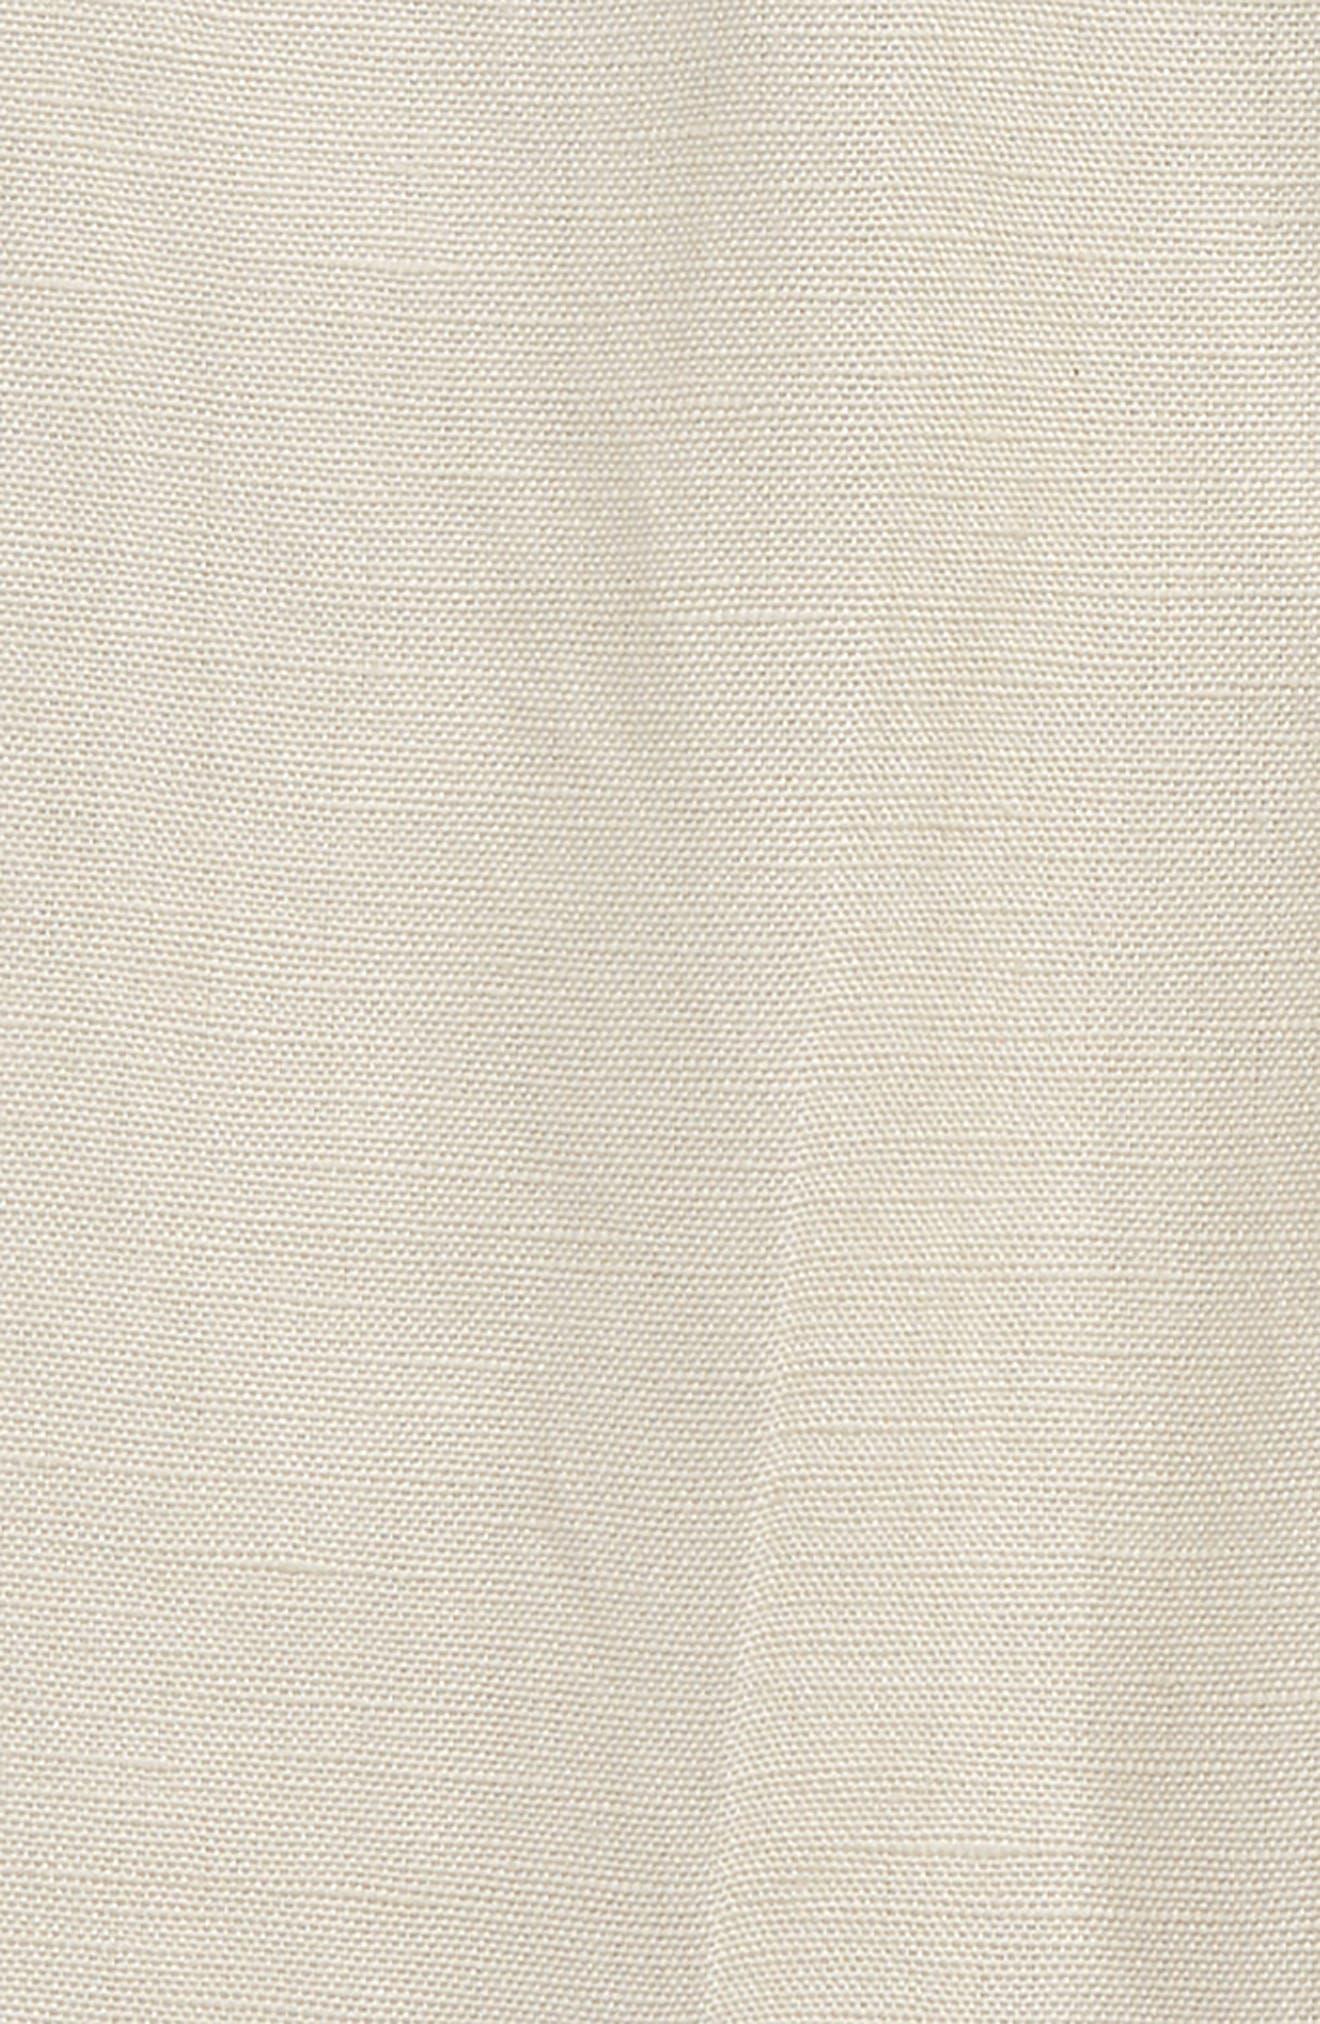 BARDOT JUNIOR,                             Miles Linen Blend Dress Pants,                             Alternate thumbnail 2, color,                             277